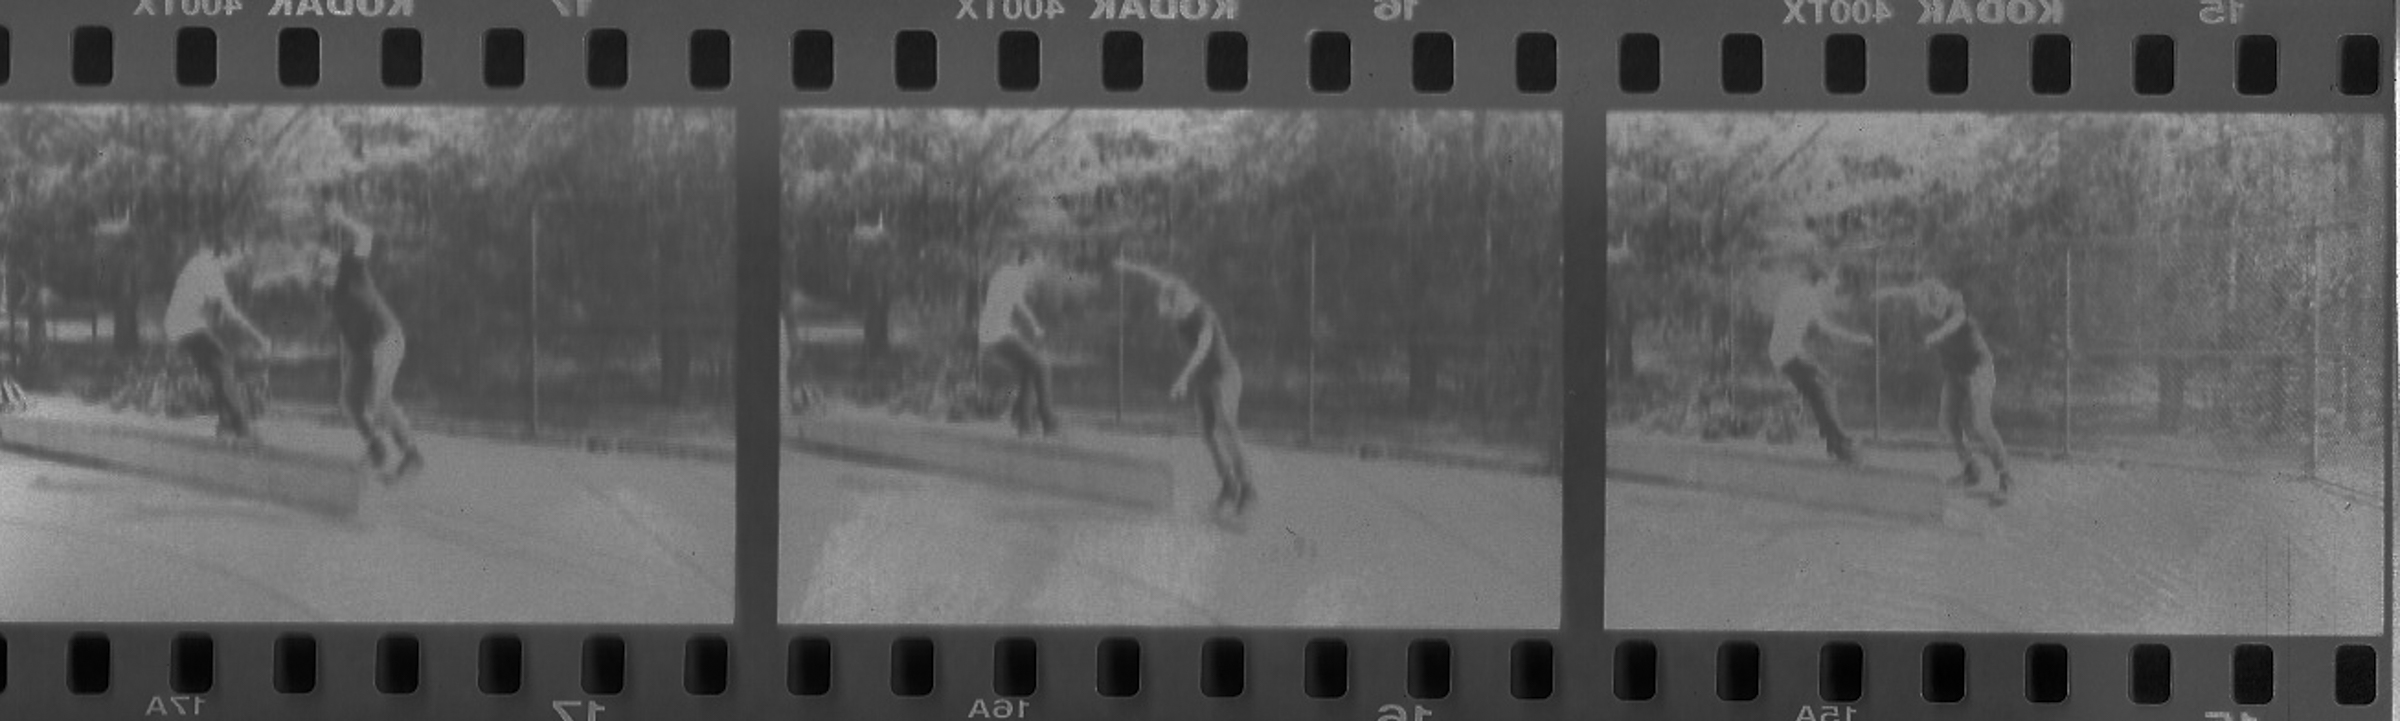 20150321-ryan and cam 2.jpg